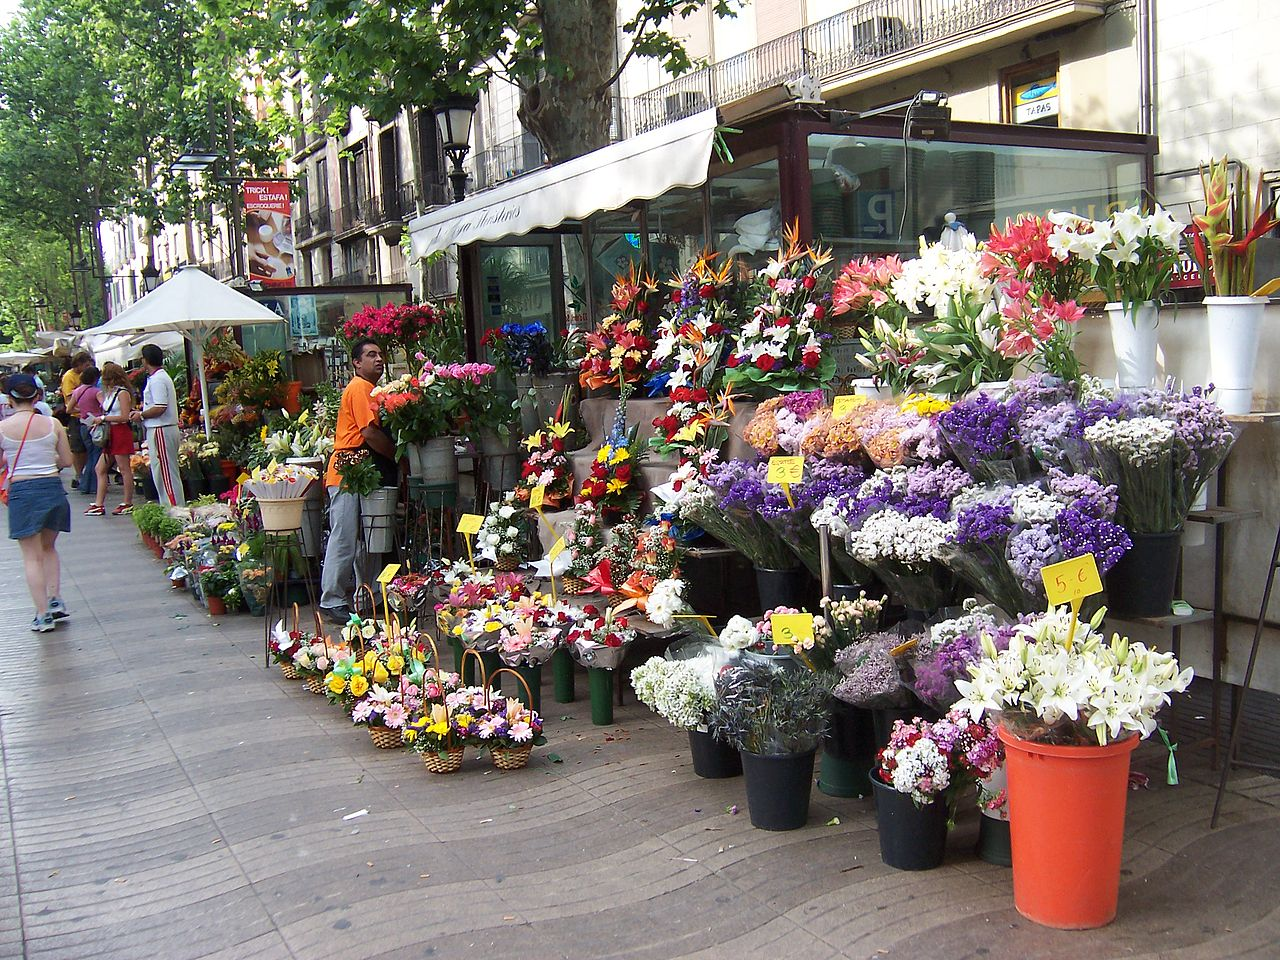 Бульвар Рамбла, магазин цветов